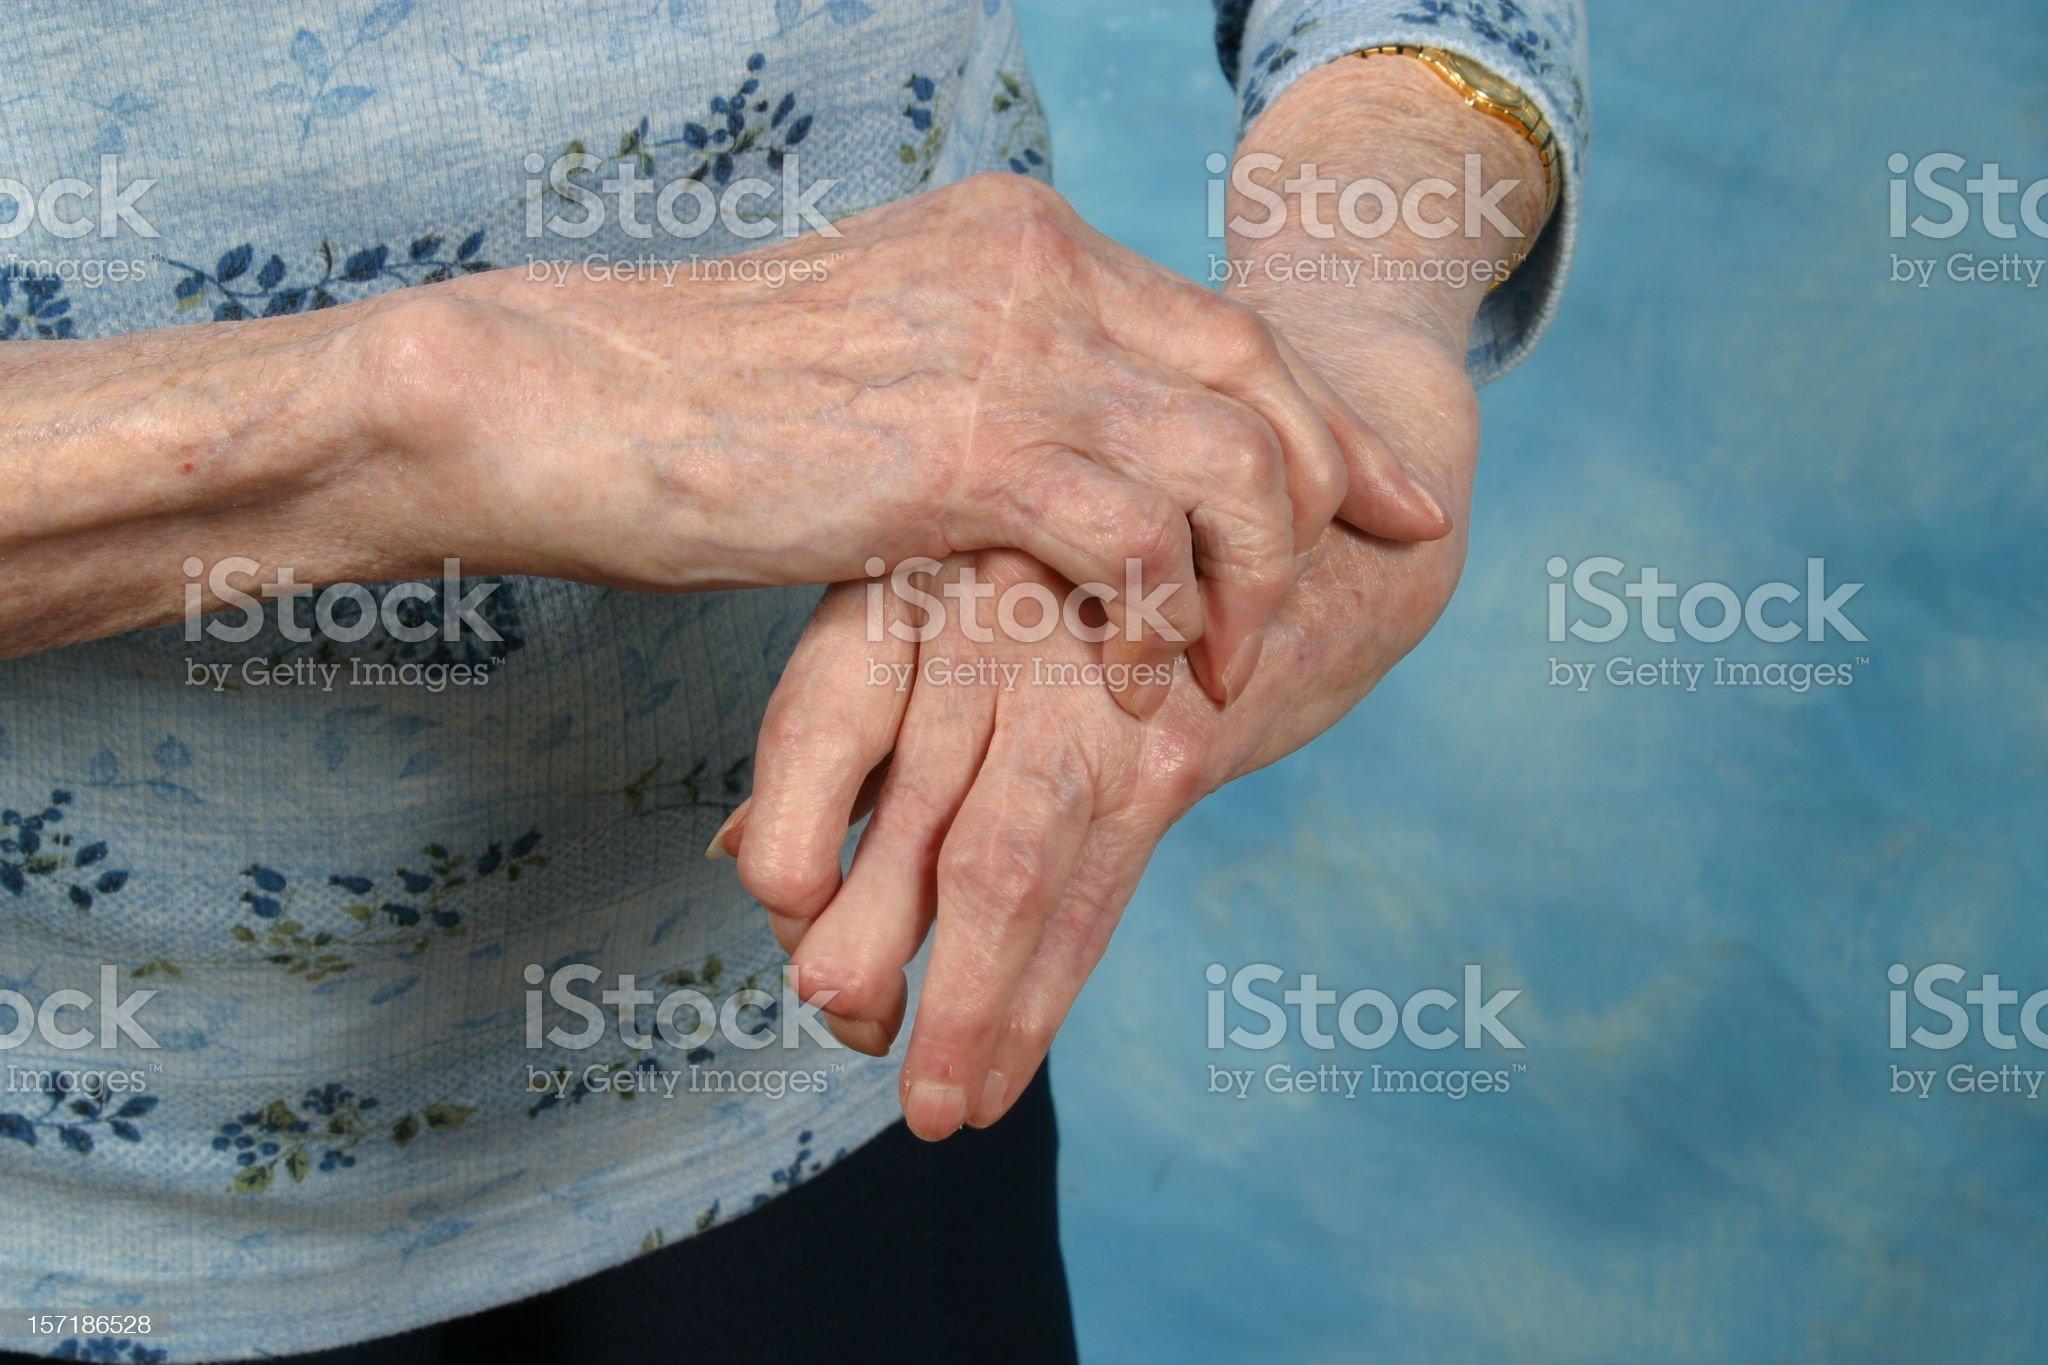 Arthritic Hands Arthritis Rheumatism royalty-free stock photo